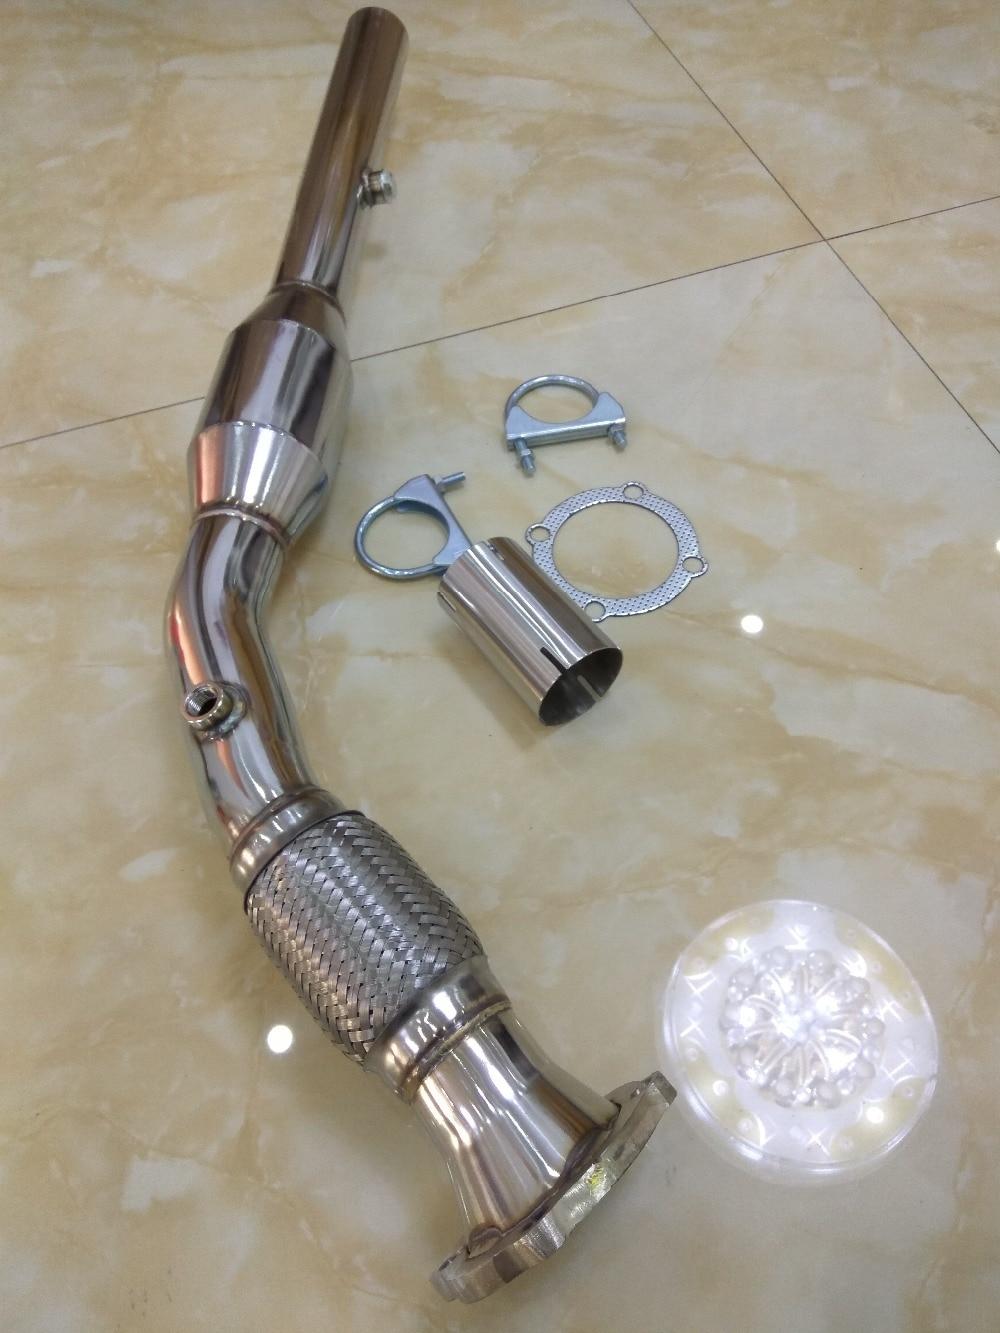 Tubo de escape deportivo para gatos para bora beetle jetta A3 1,8 T AUM AUQ GOLF MK4 GTI 1,8 l A3 TT, tubo de bajada TURBO de 200 celdas